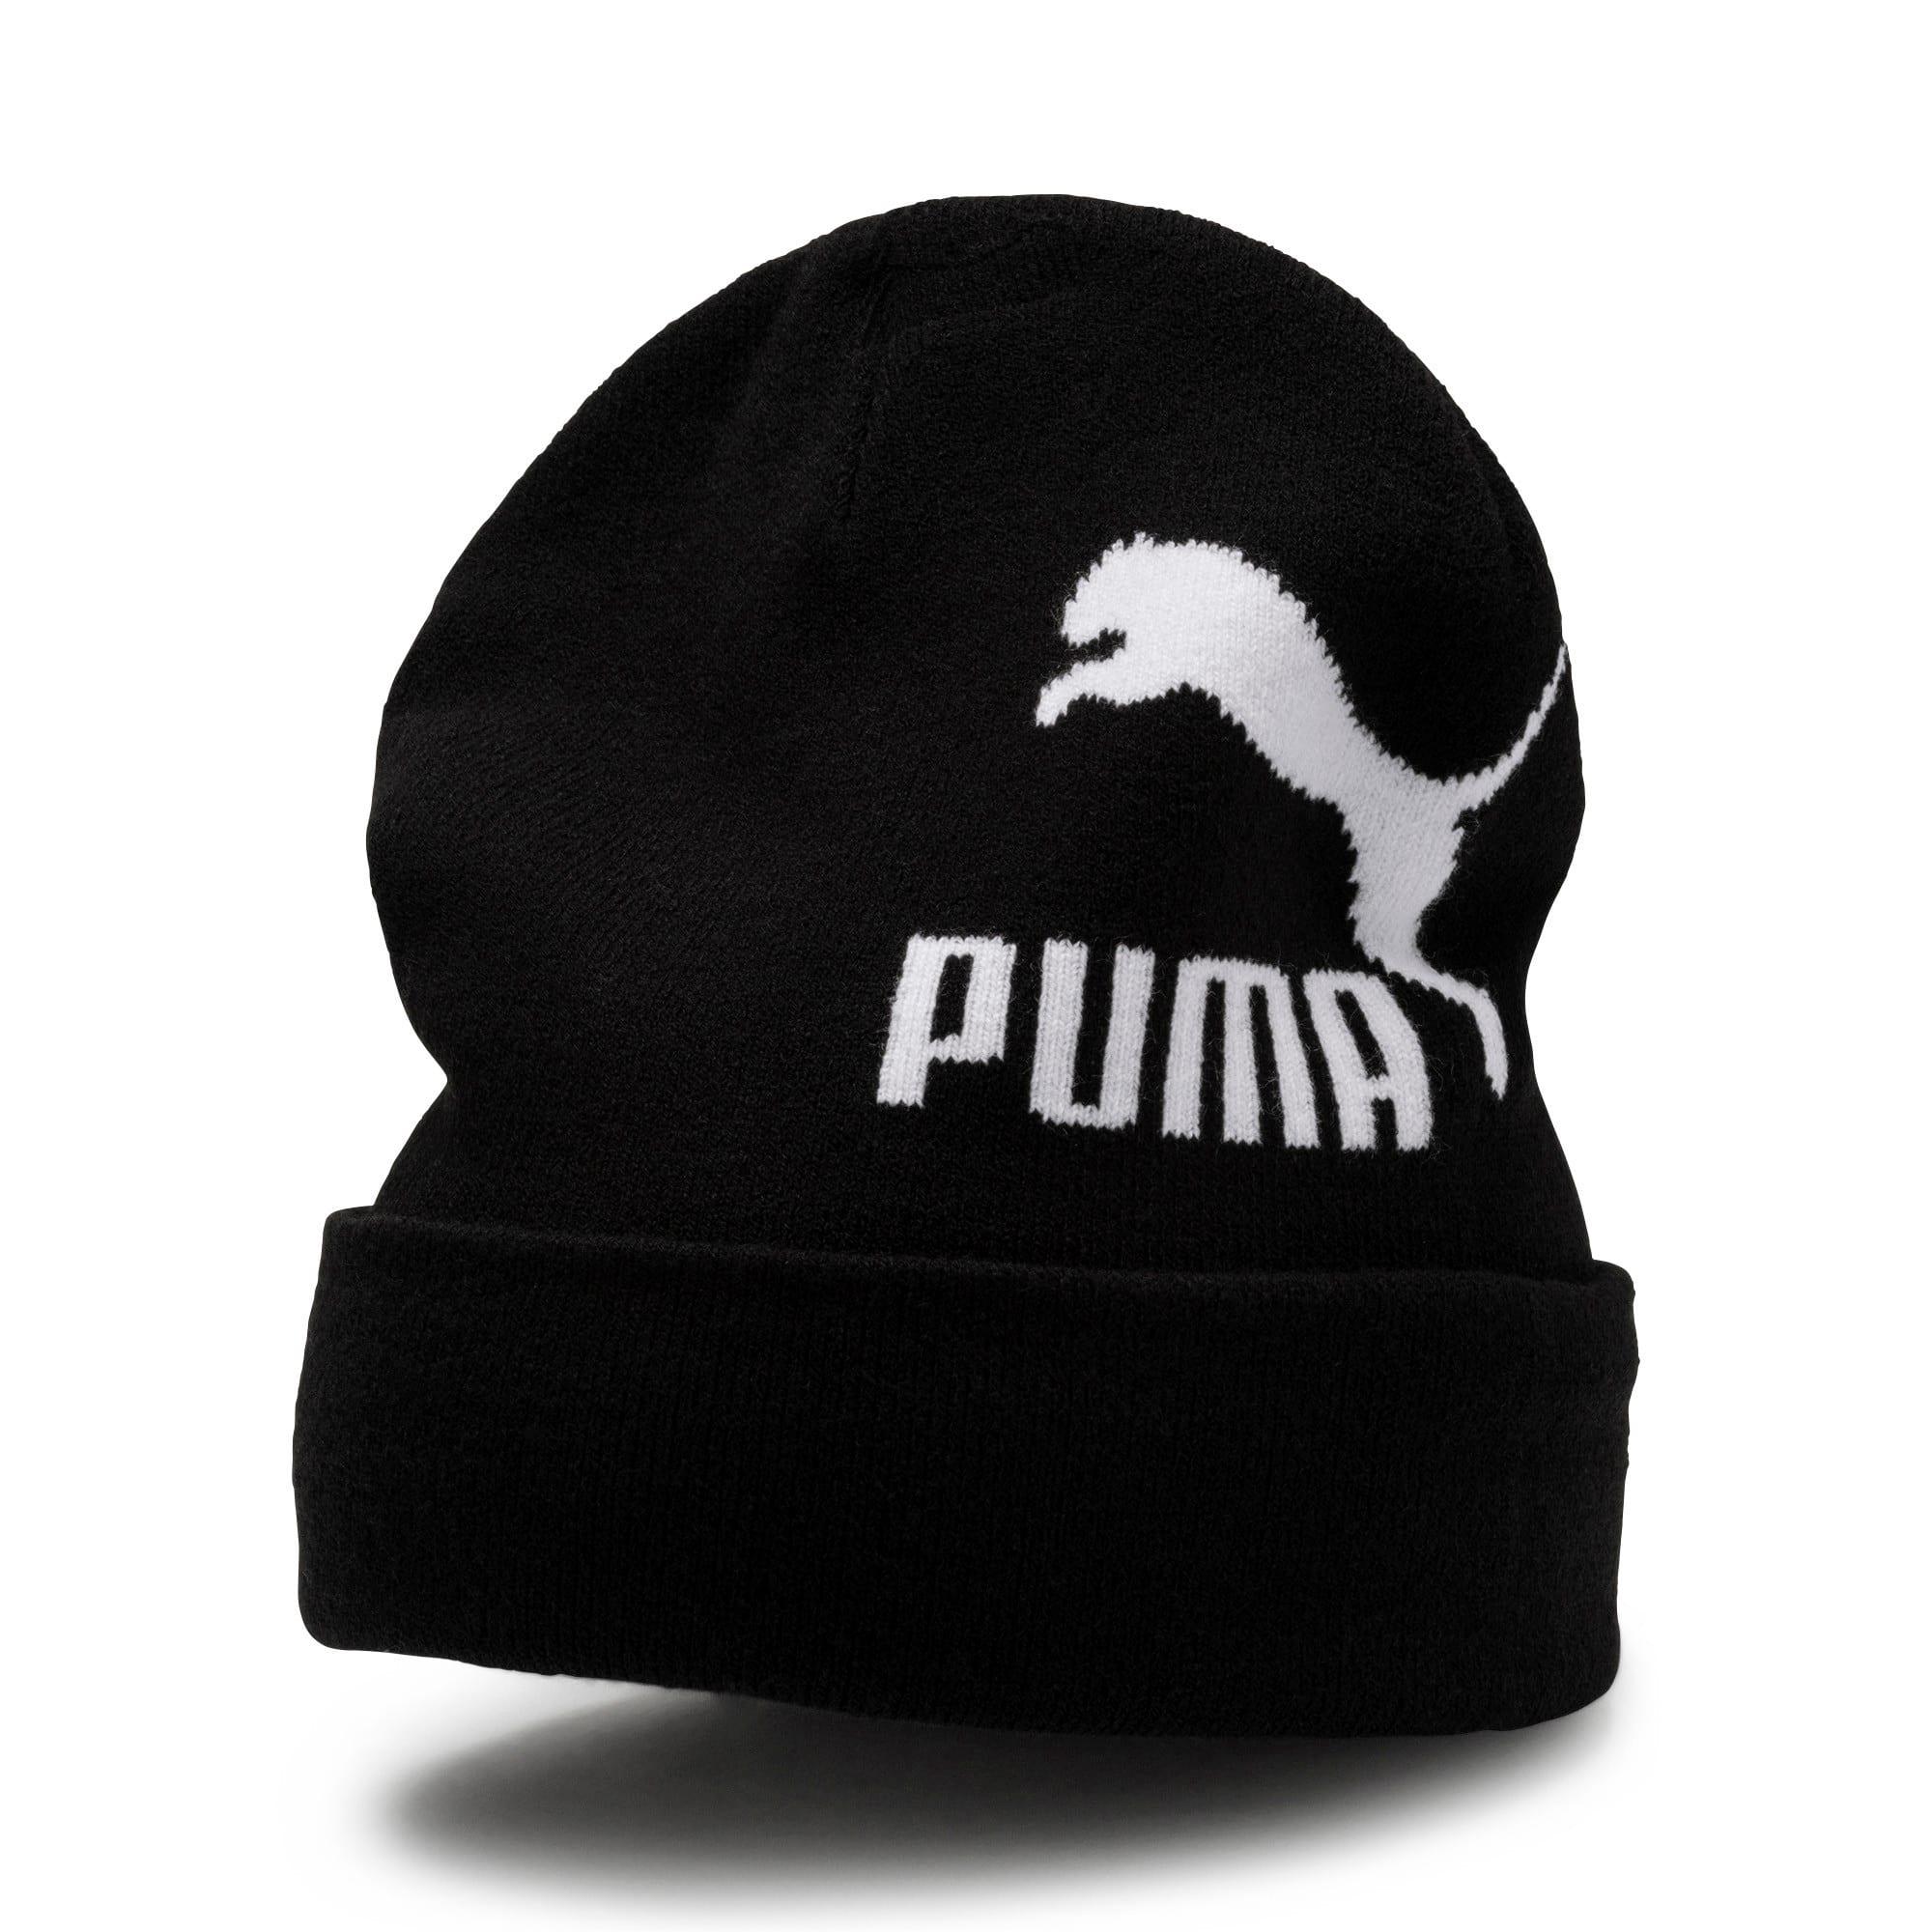 Thumbnail 1 of Archive Logo Beanie, Puma Black, medium-IND